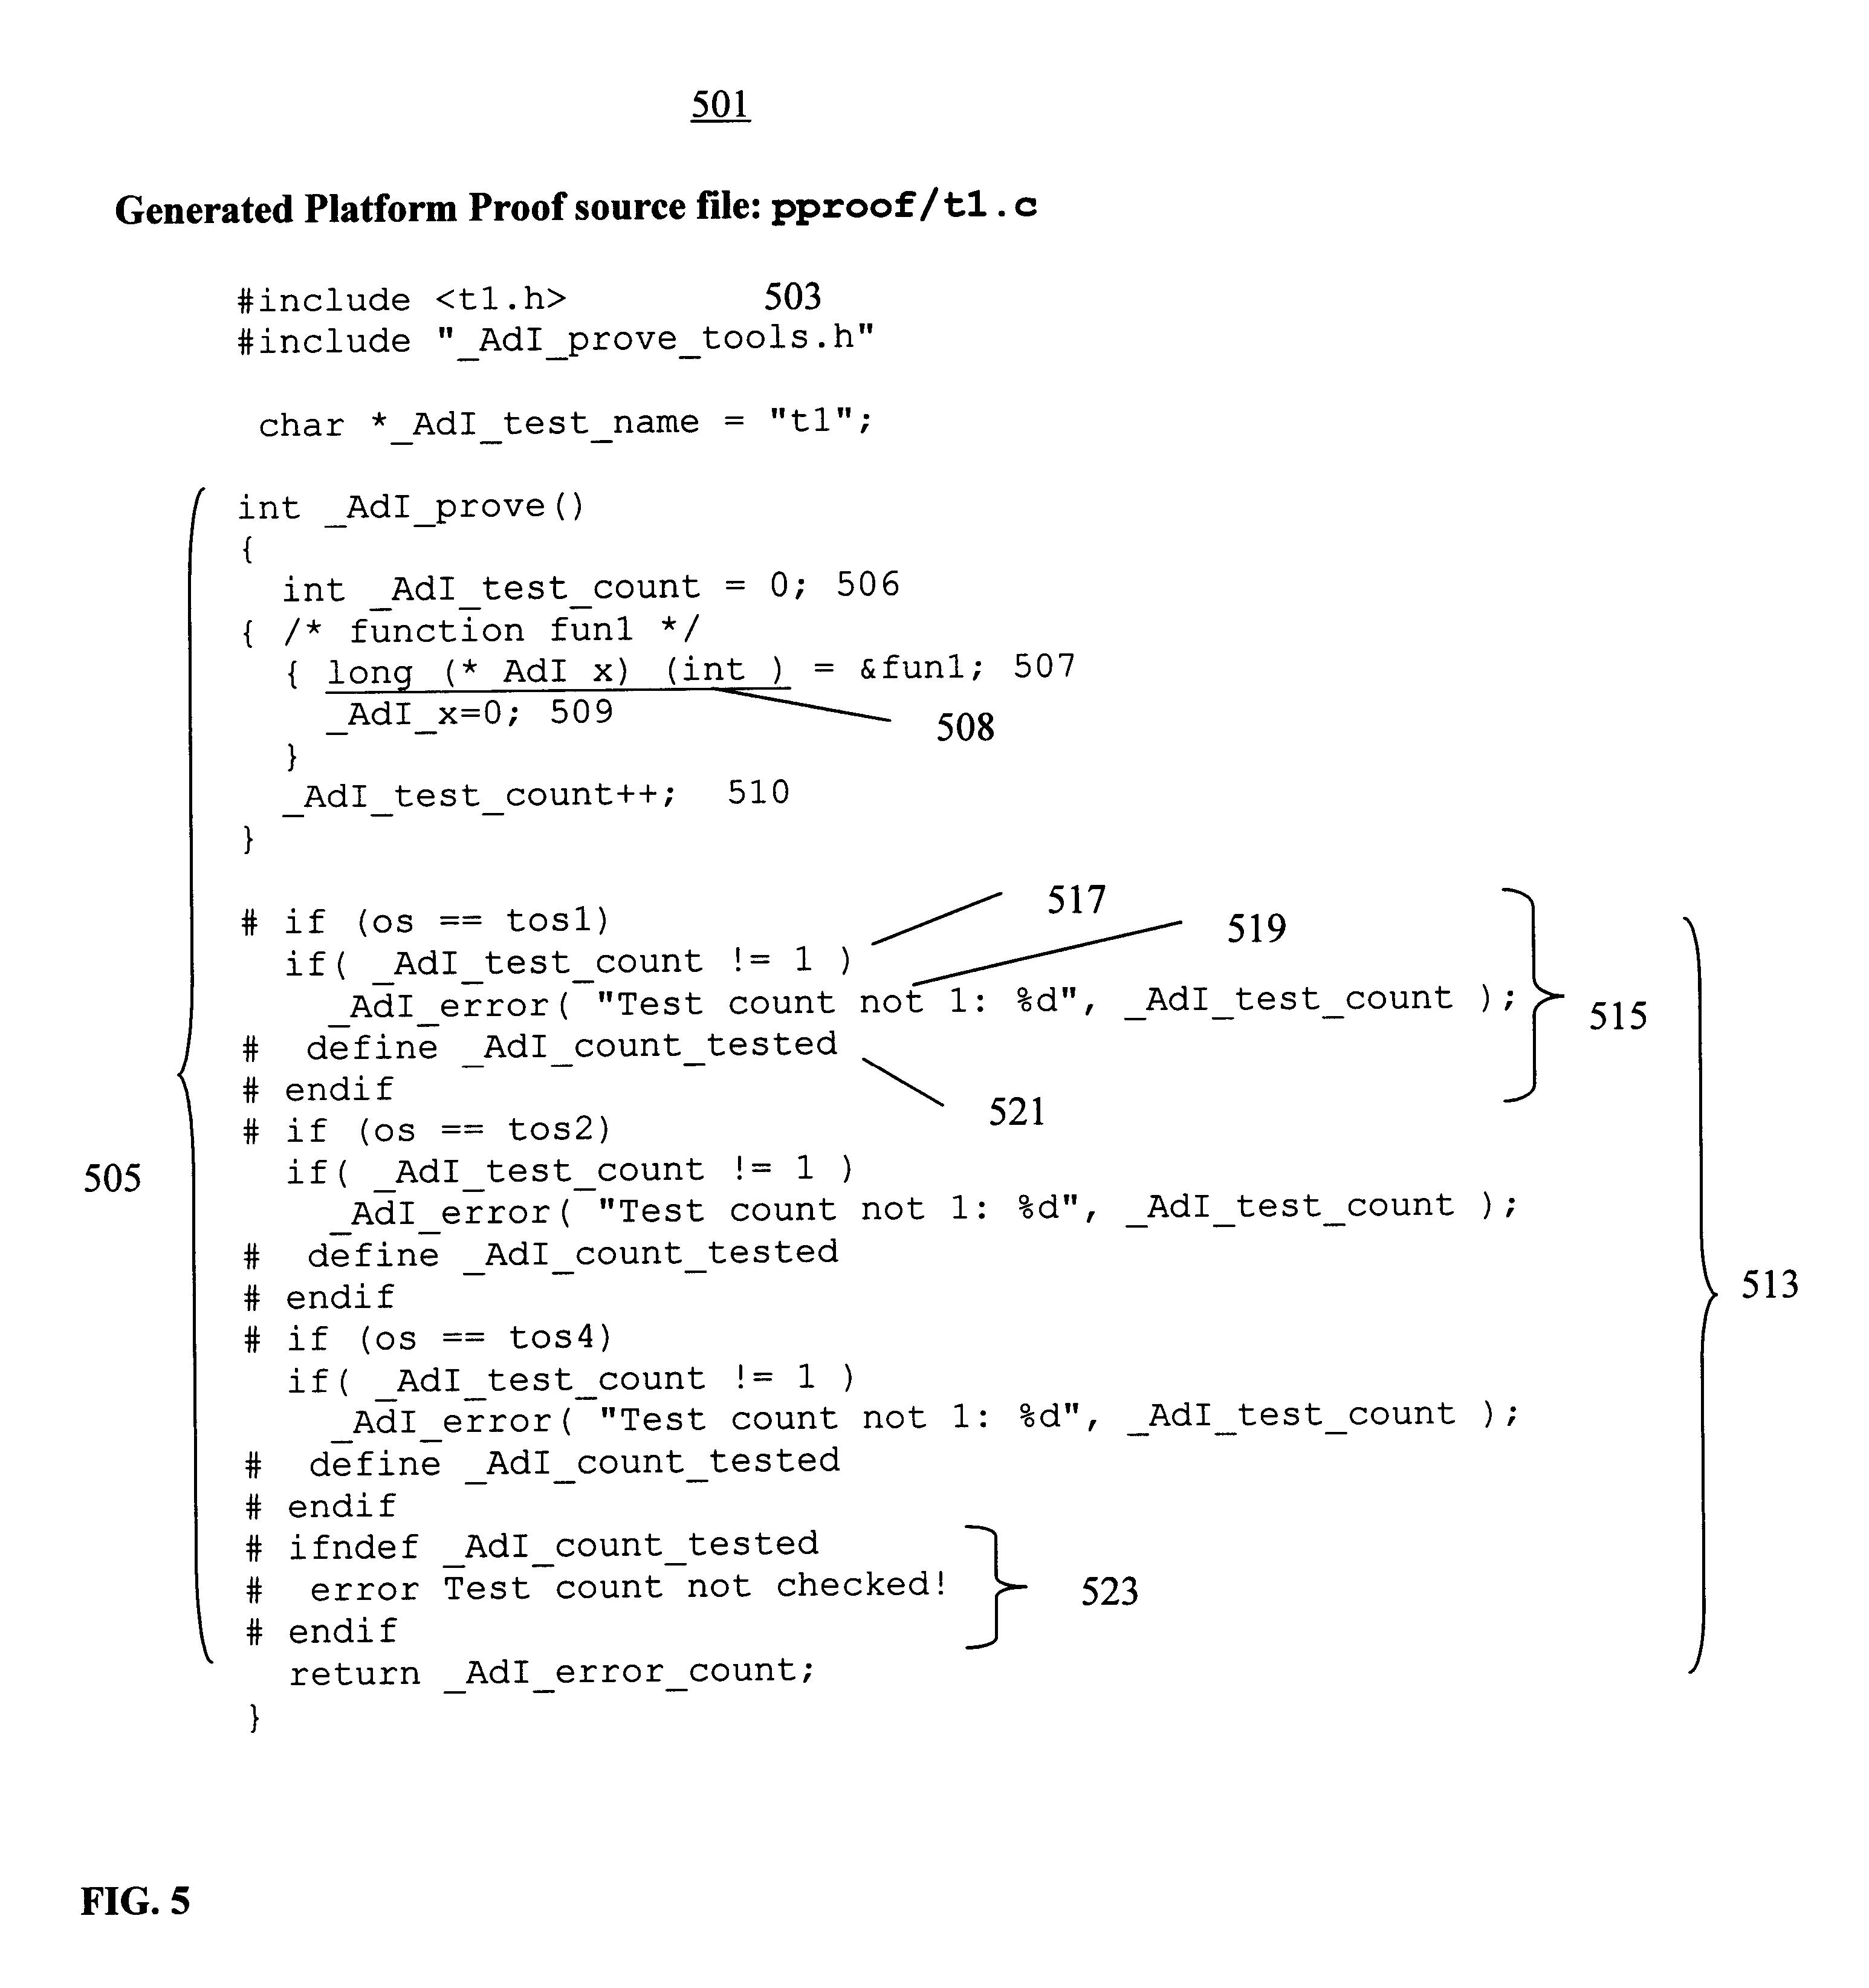 Patent US 6,769,115 B1